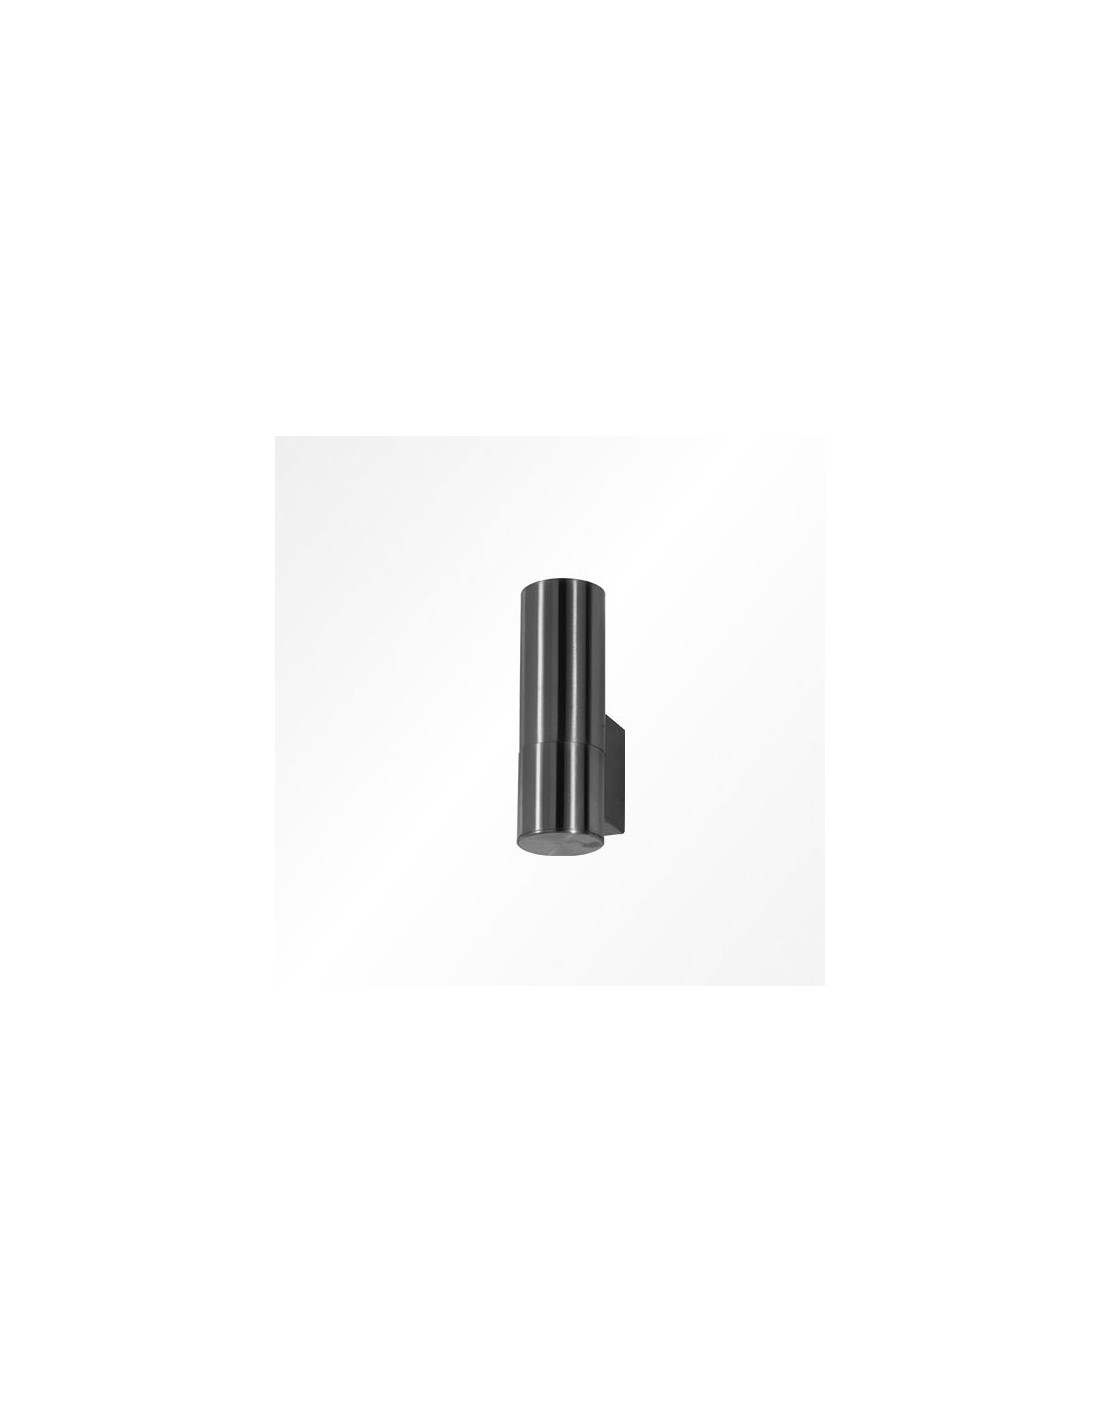 Applique Yuuki 6 Mono de Inverlight- Valente design